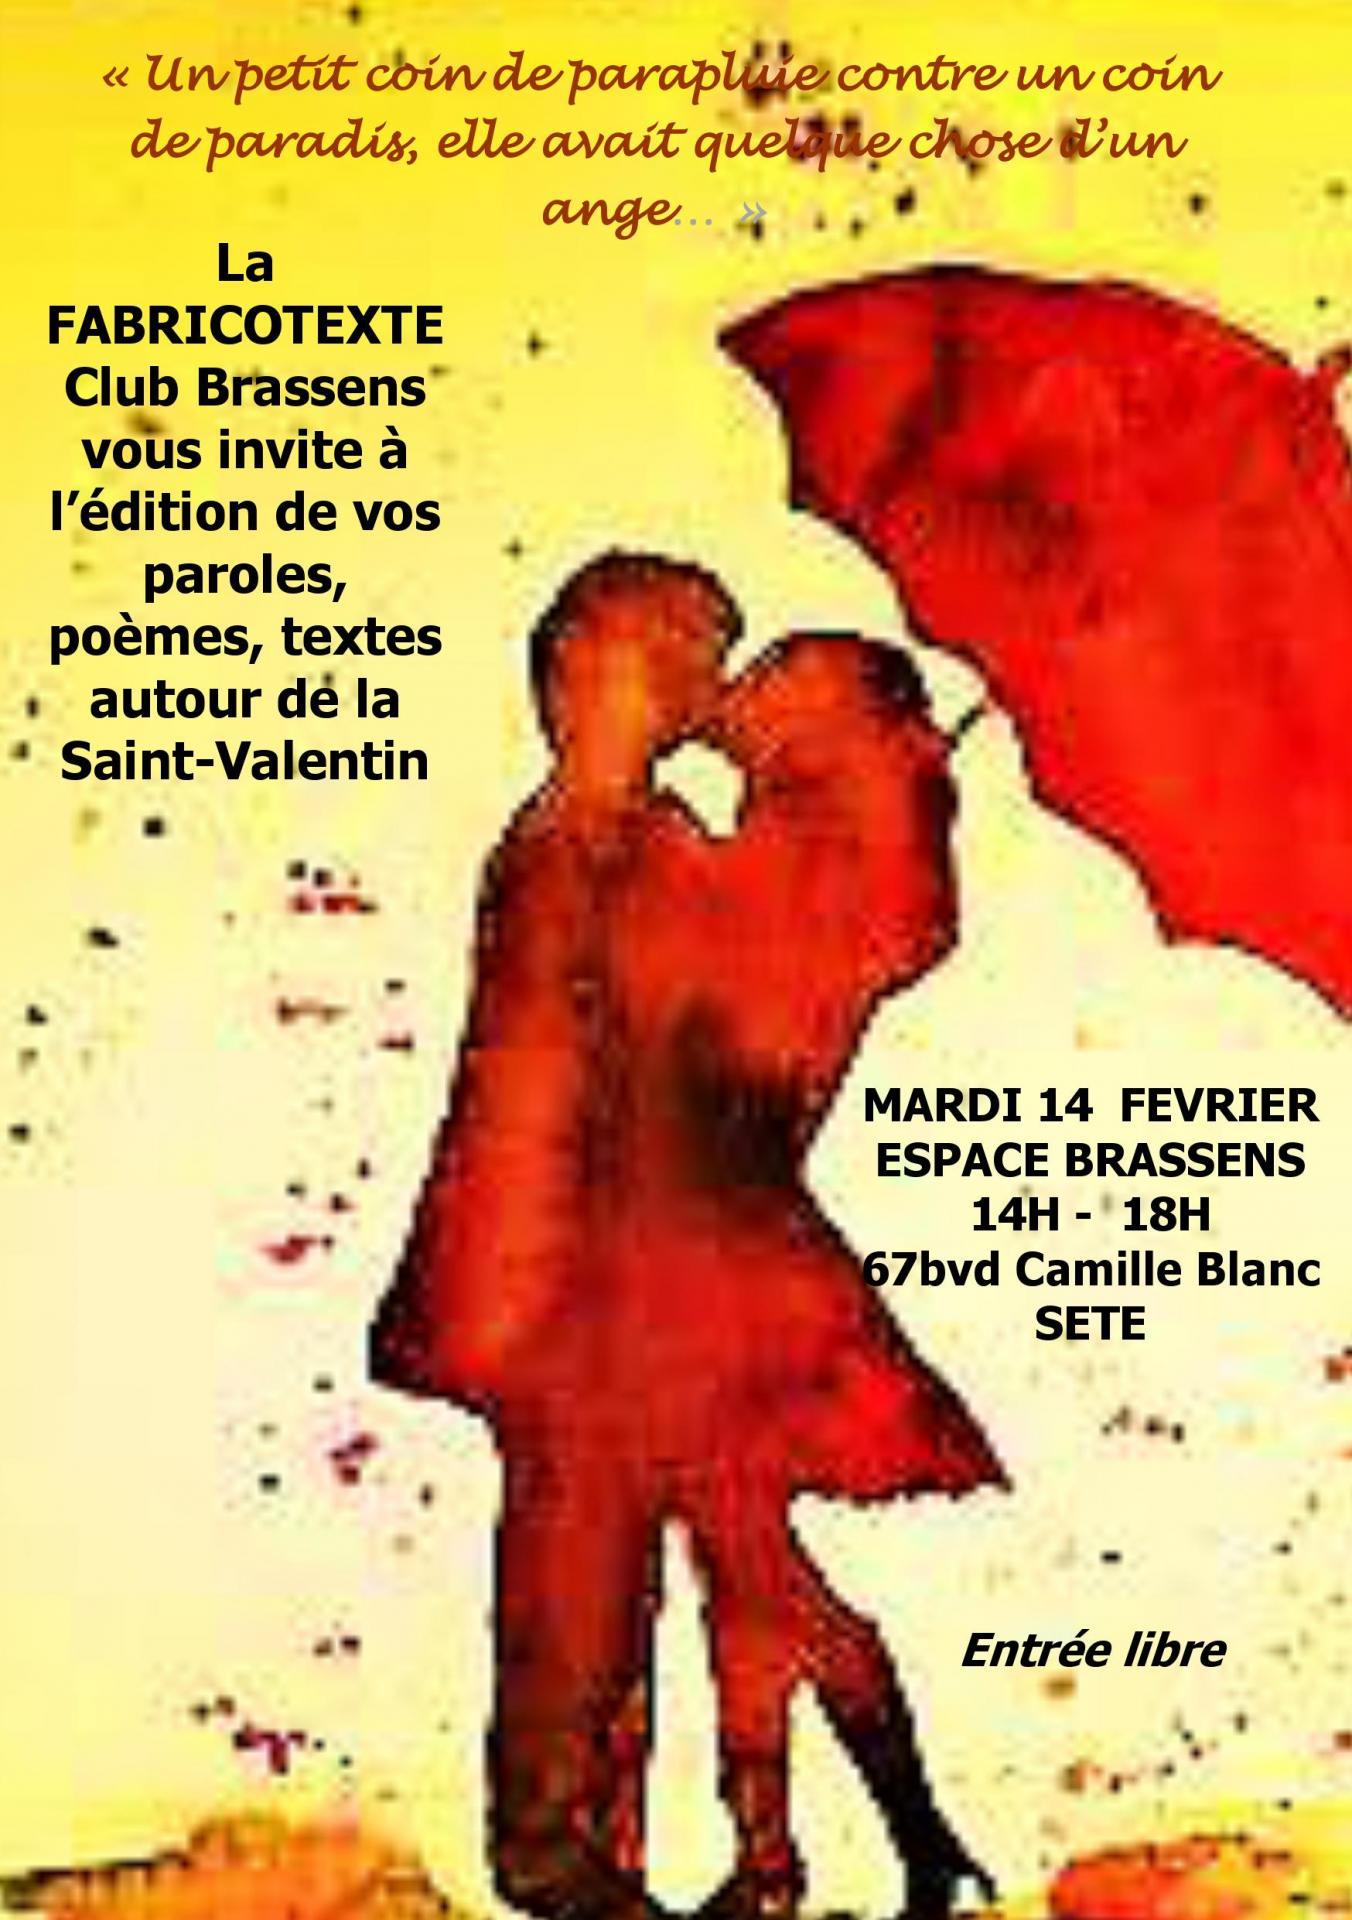 Image affiche st valentin